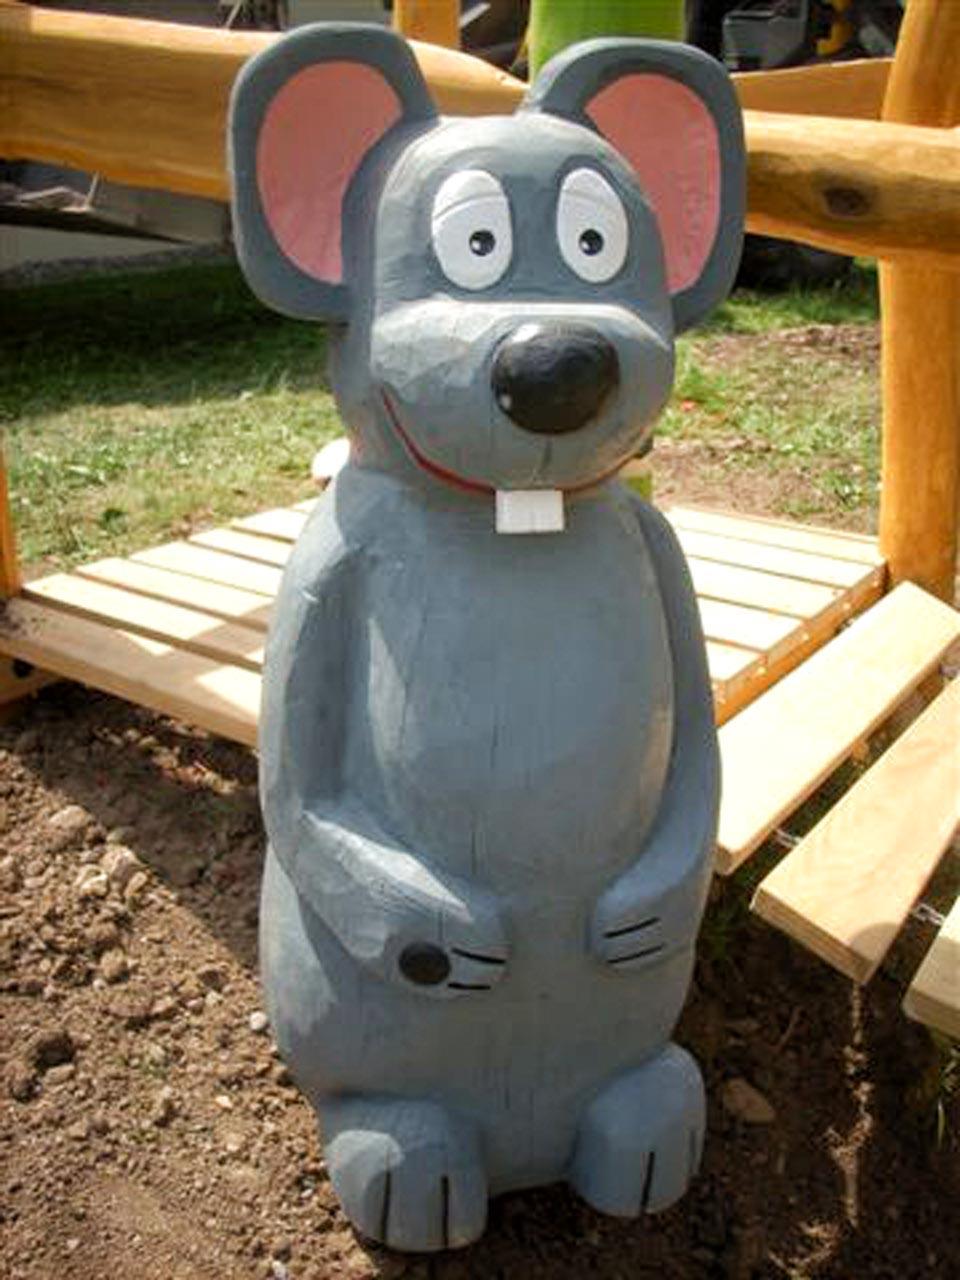 N 57 Skulptur Maus - Mausemann